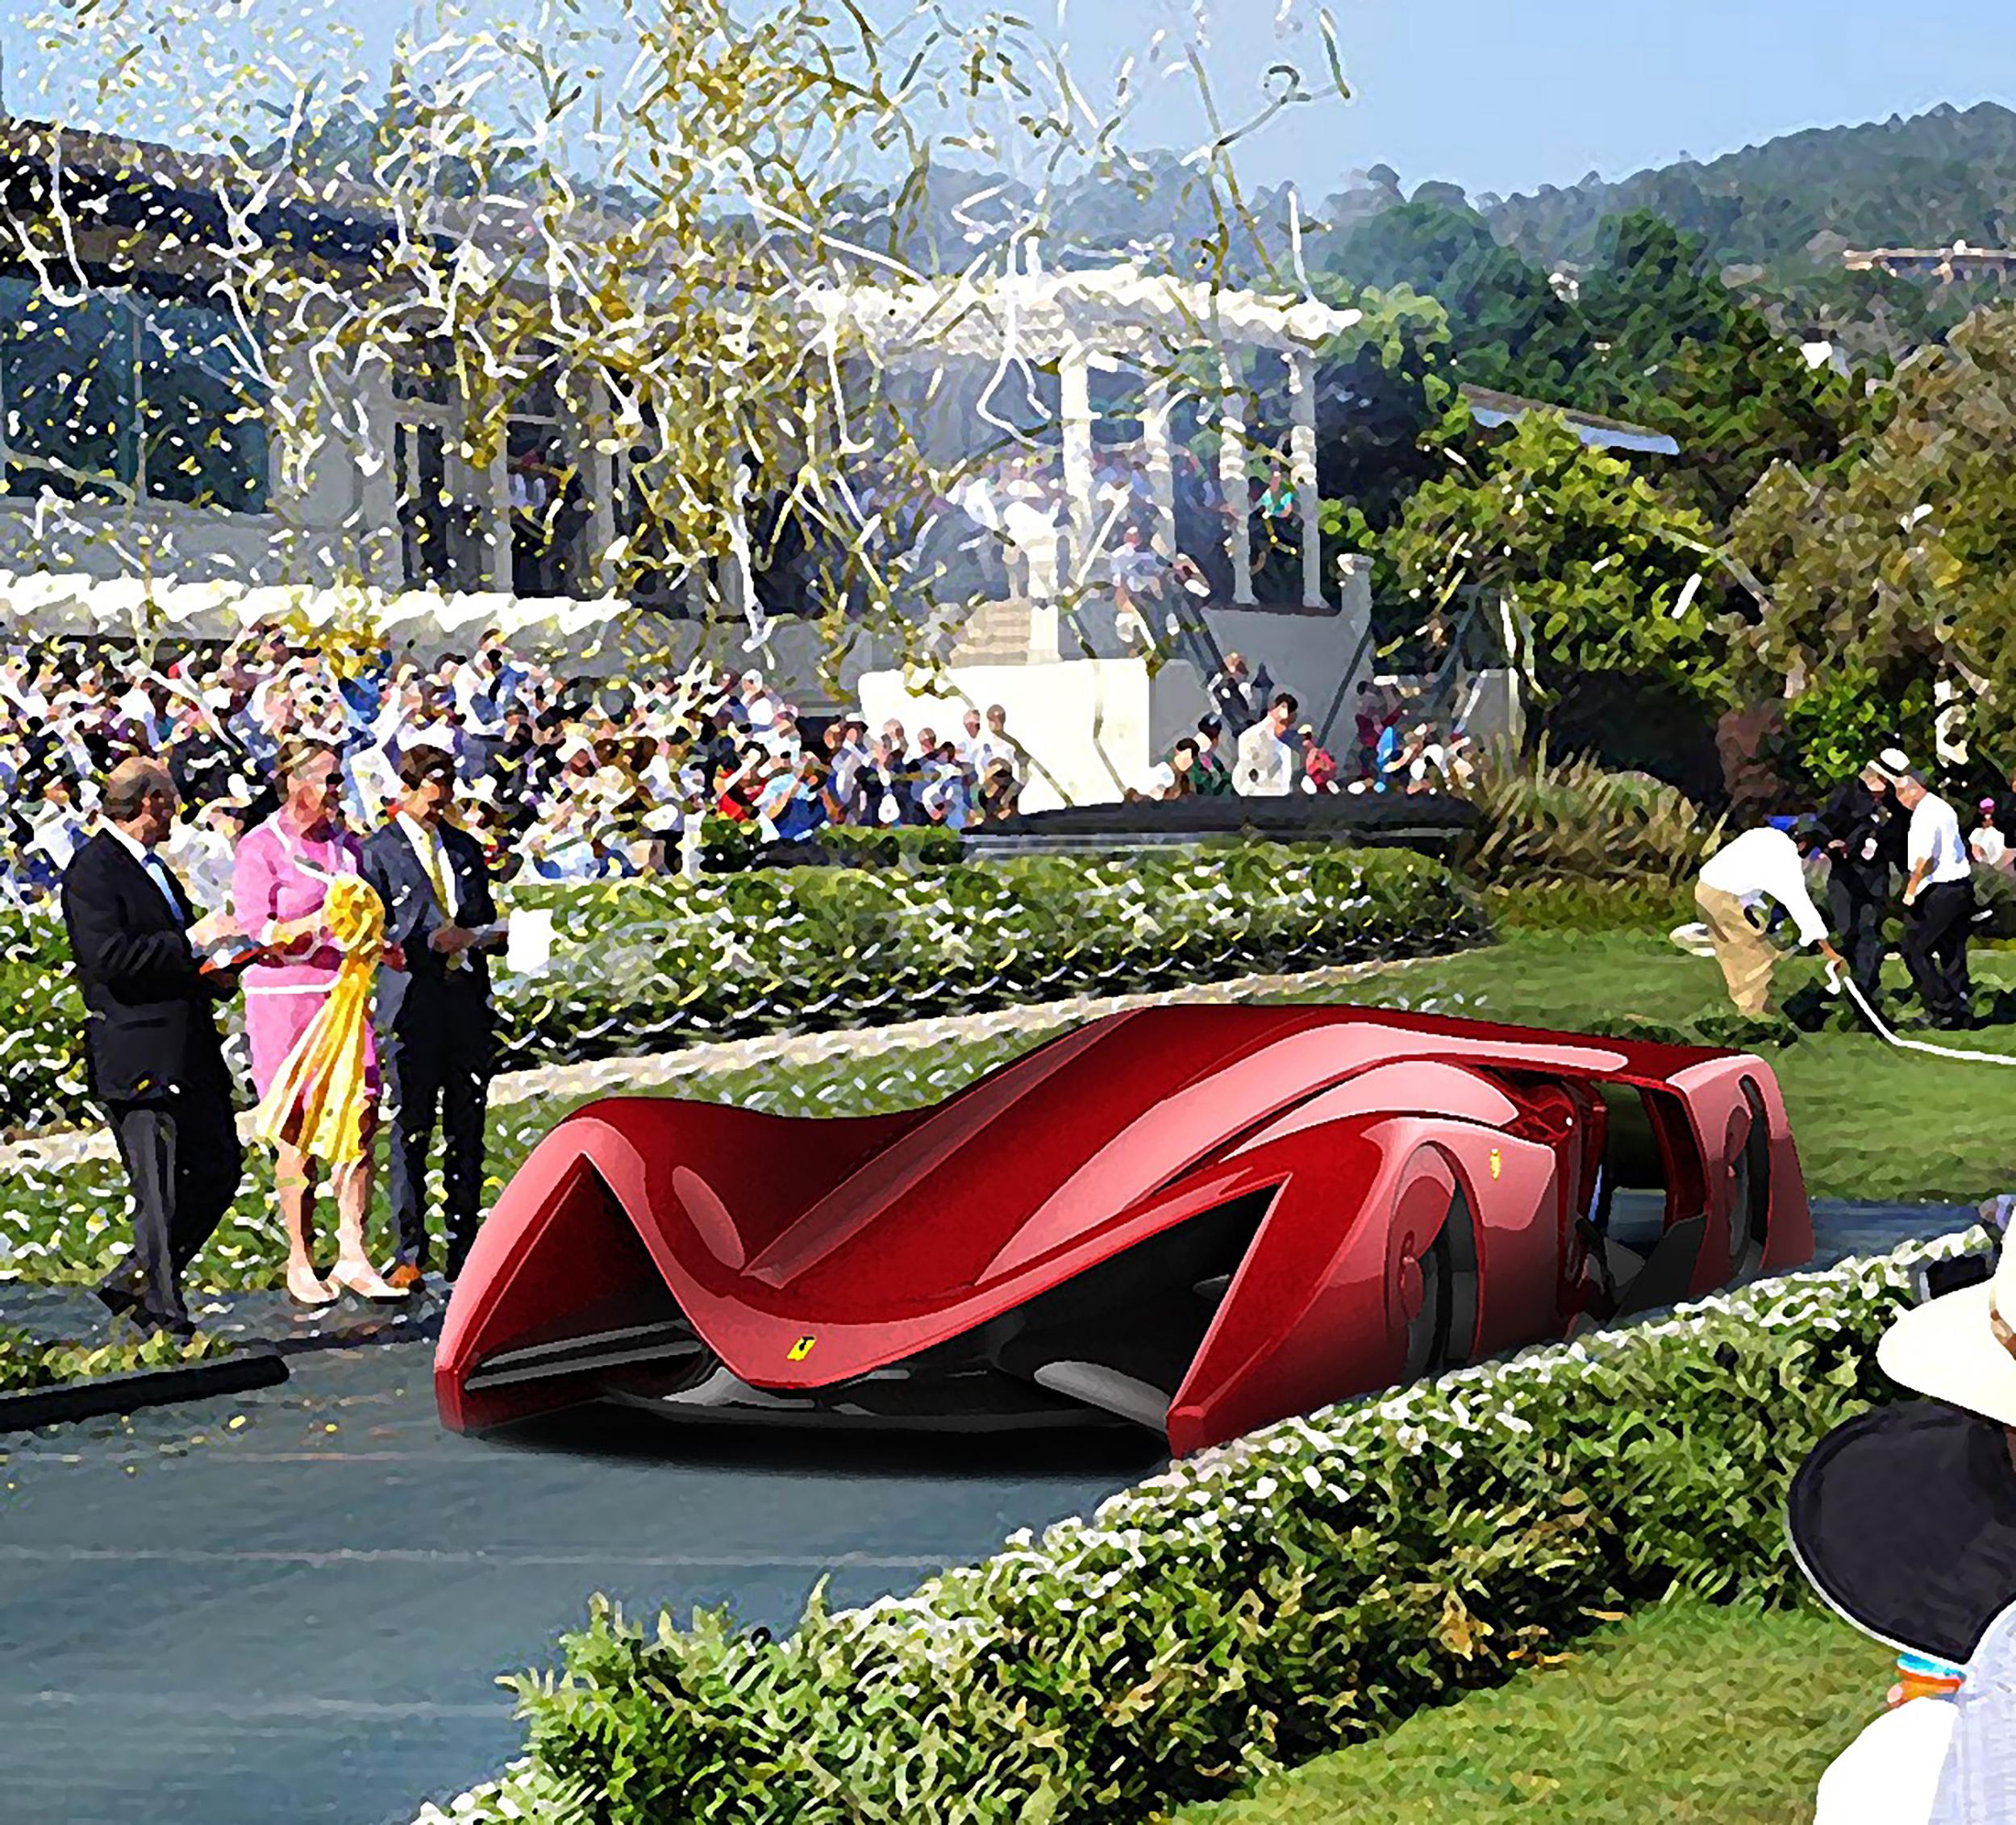 Ferrari Gothica Rossa 2025 Electric Hypercar Concept By